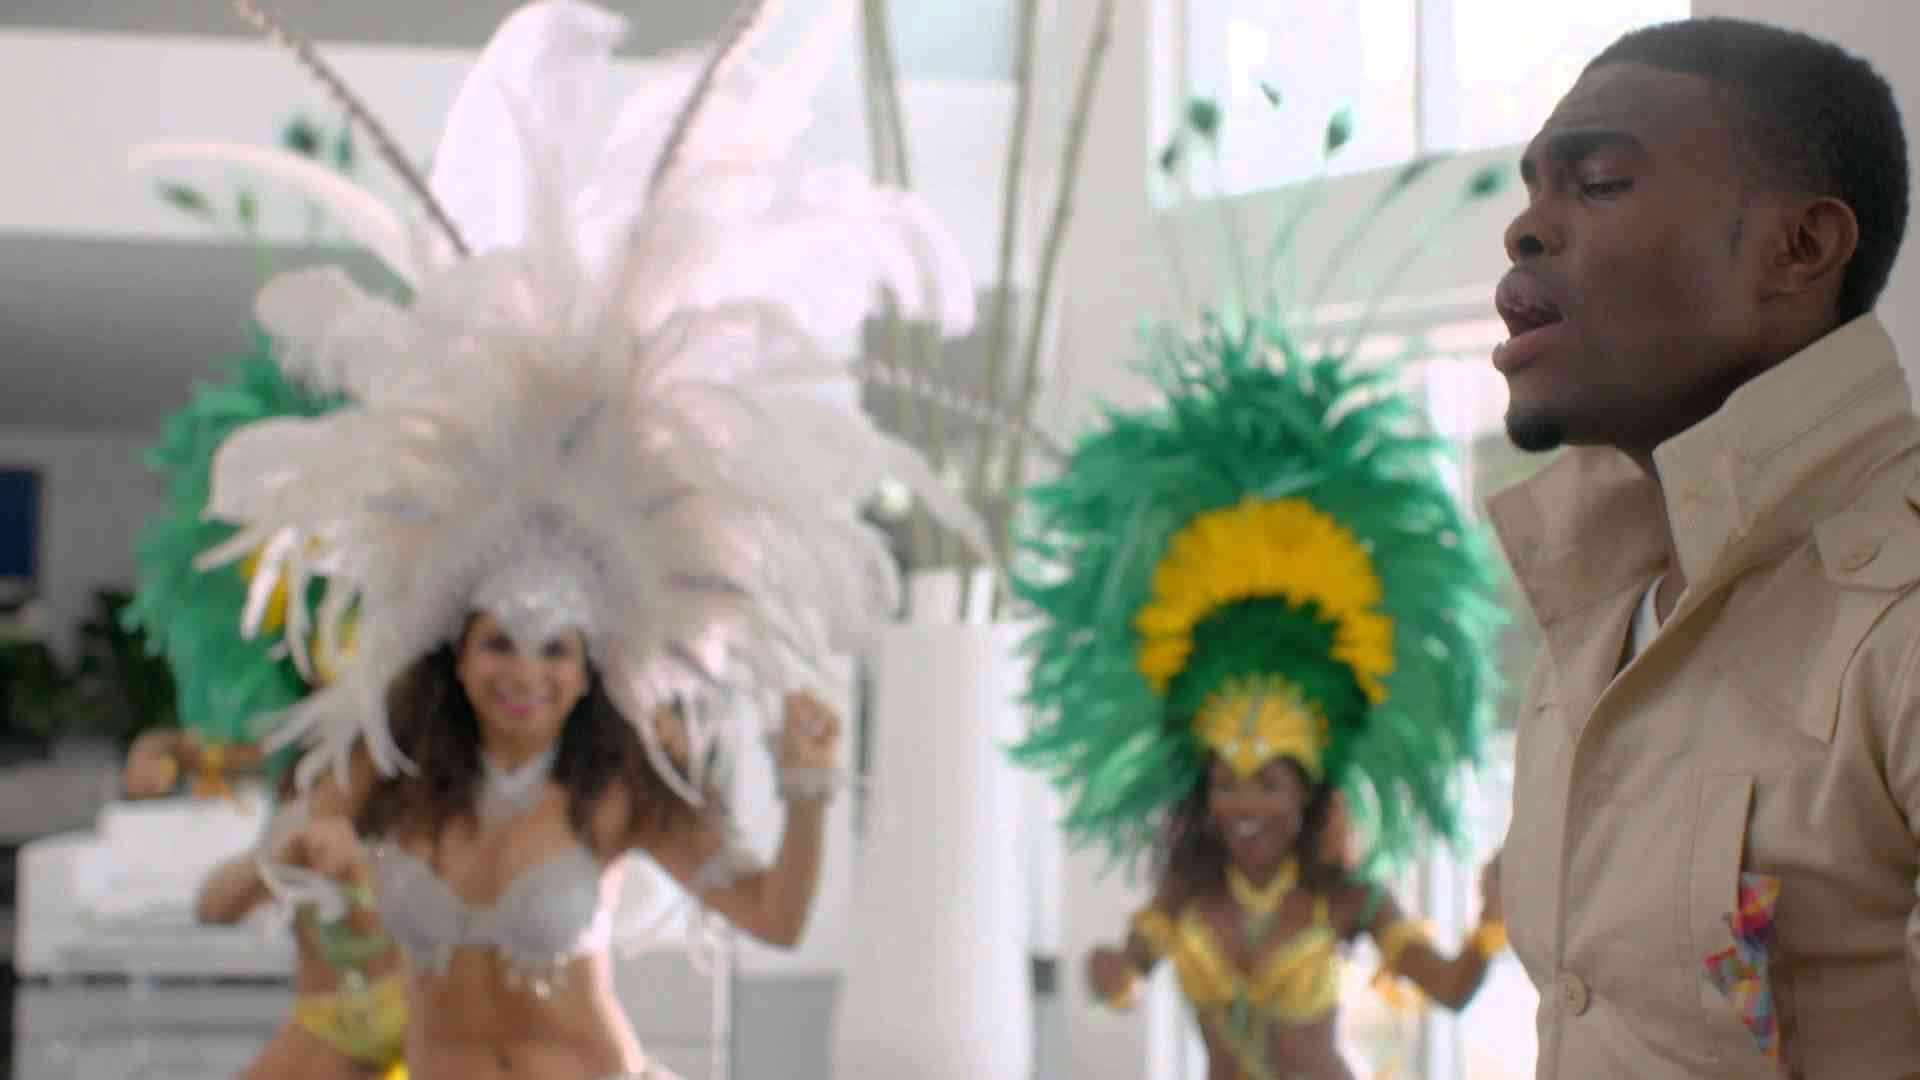 Omi - Hula Hoop (Official Video) - YouTube